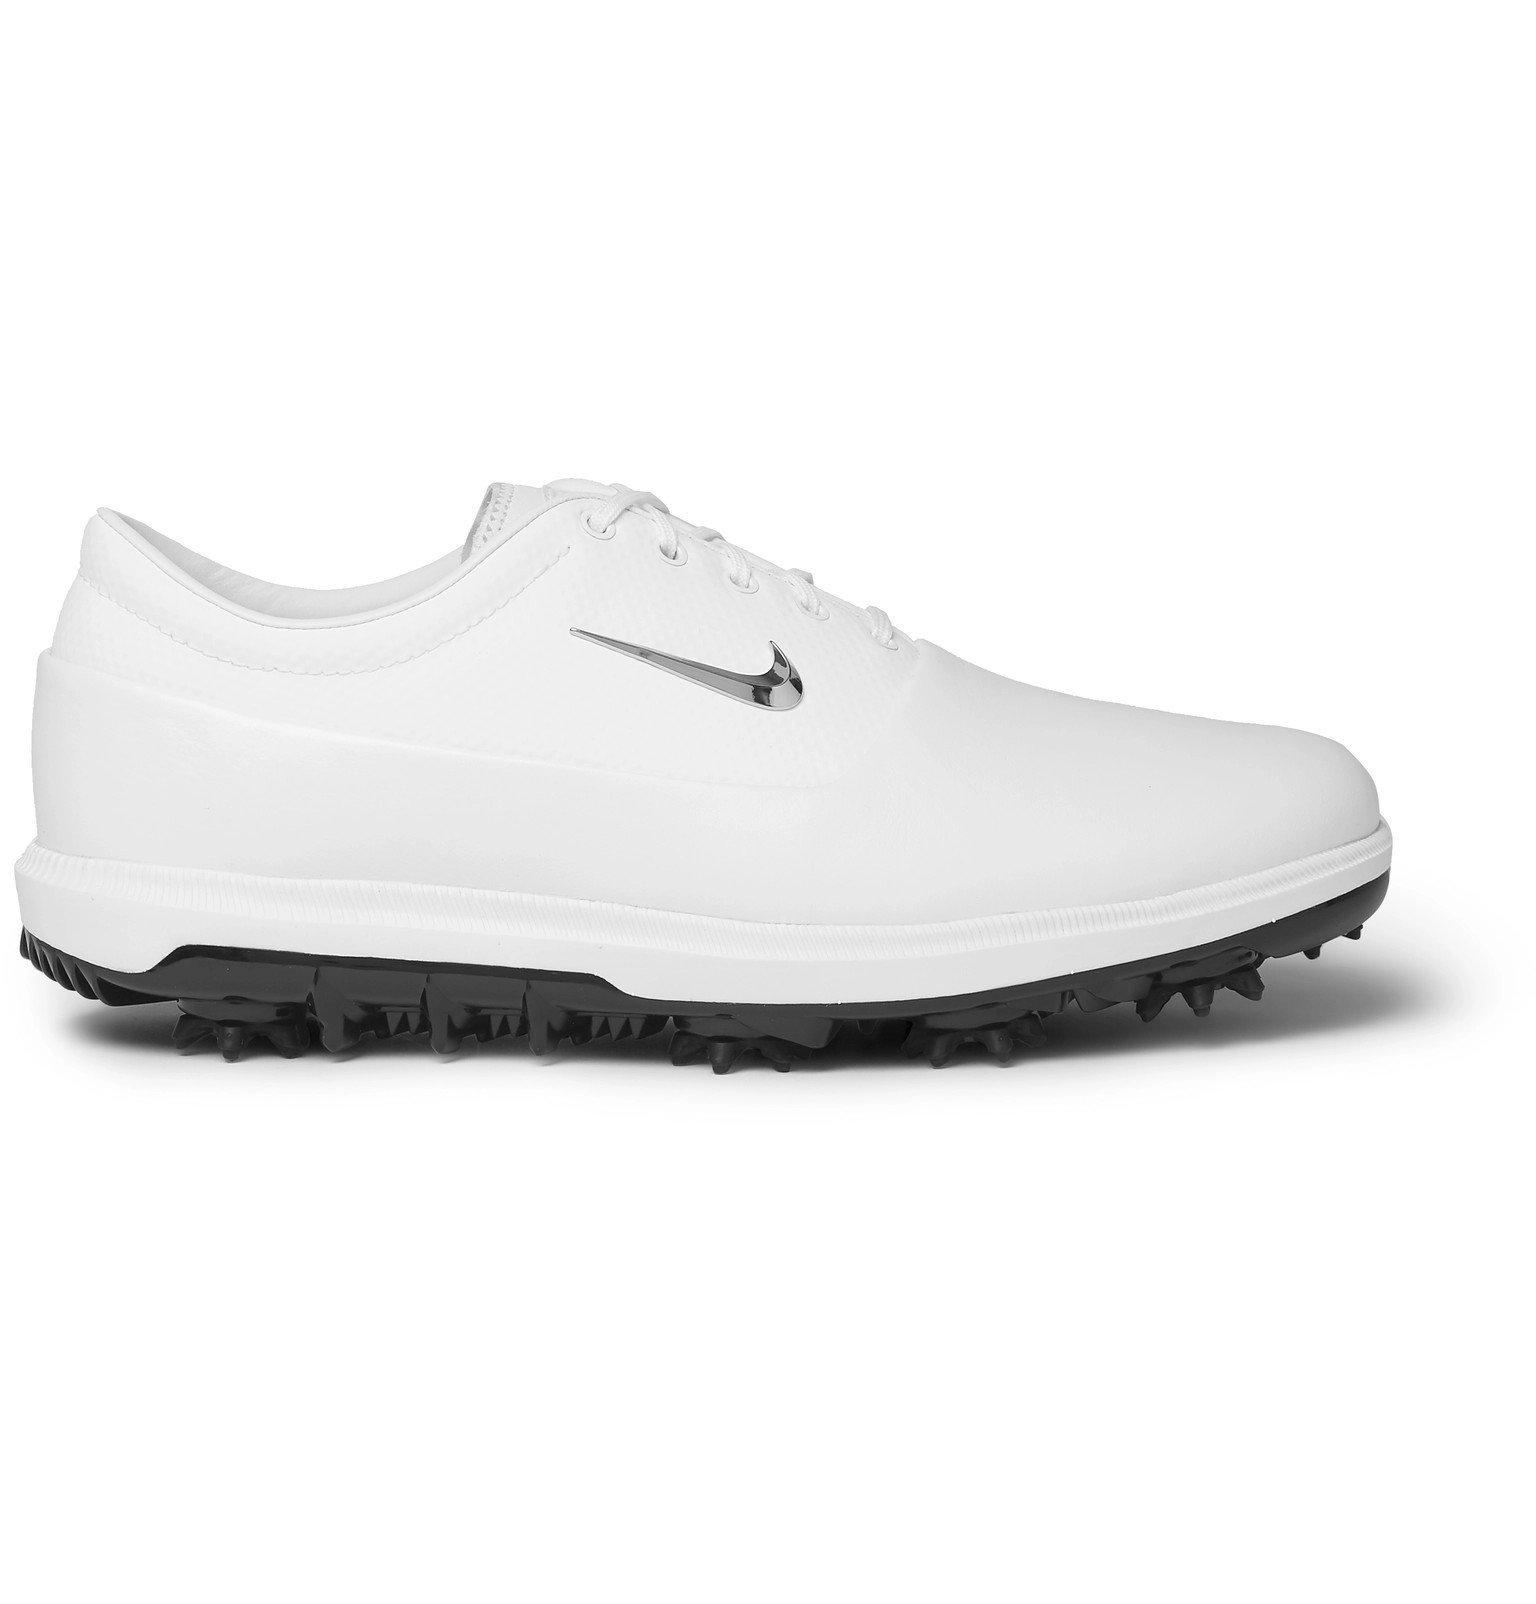 Nike Golf - Air Zoom Victory Tour Golf Shoes - White Nike Golf